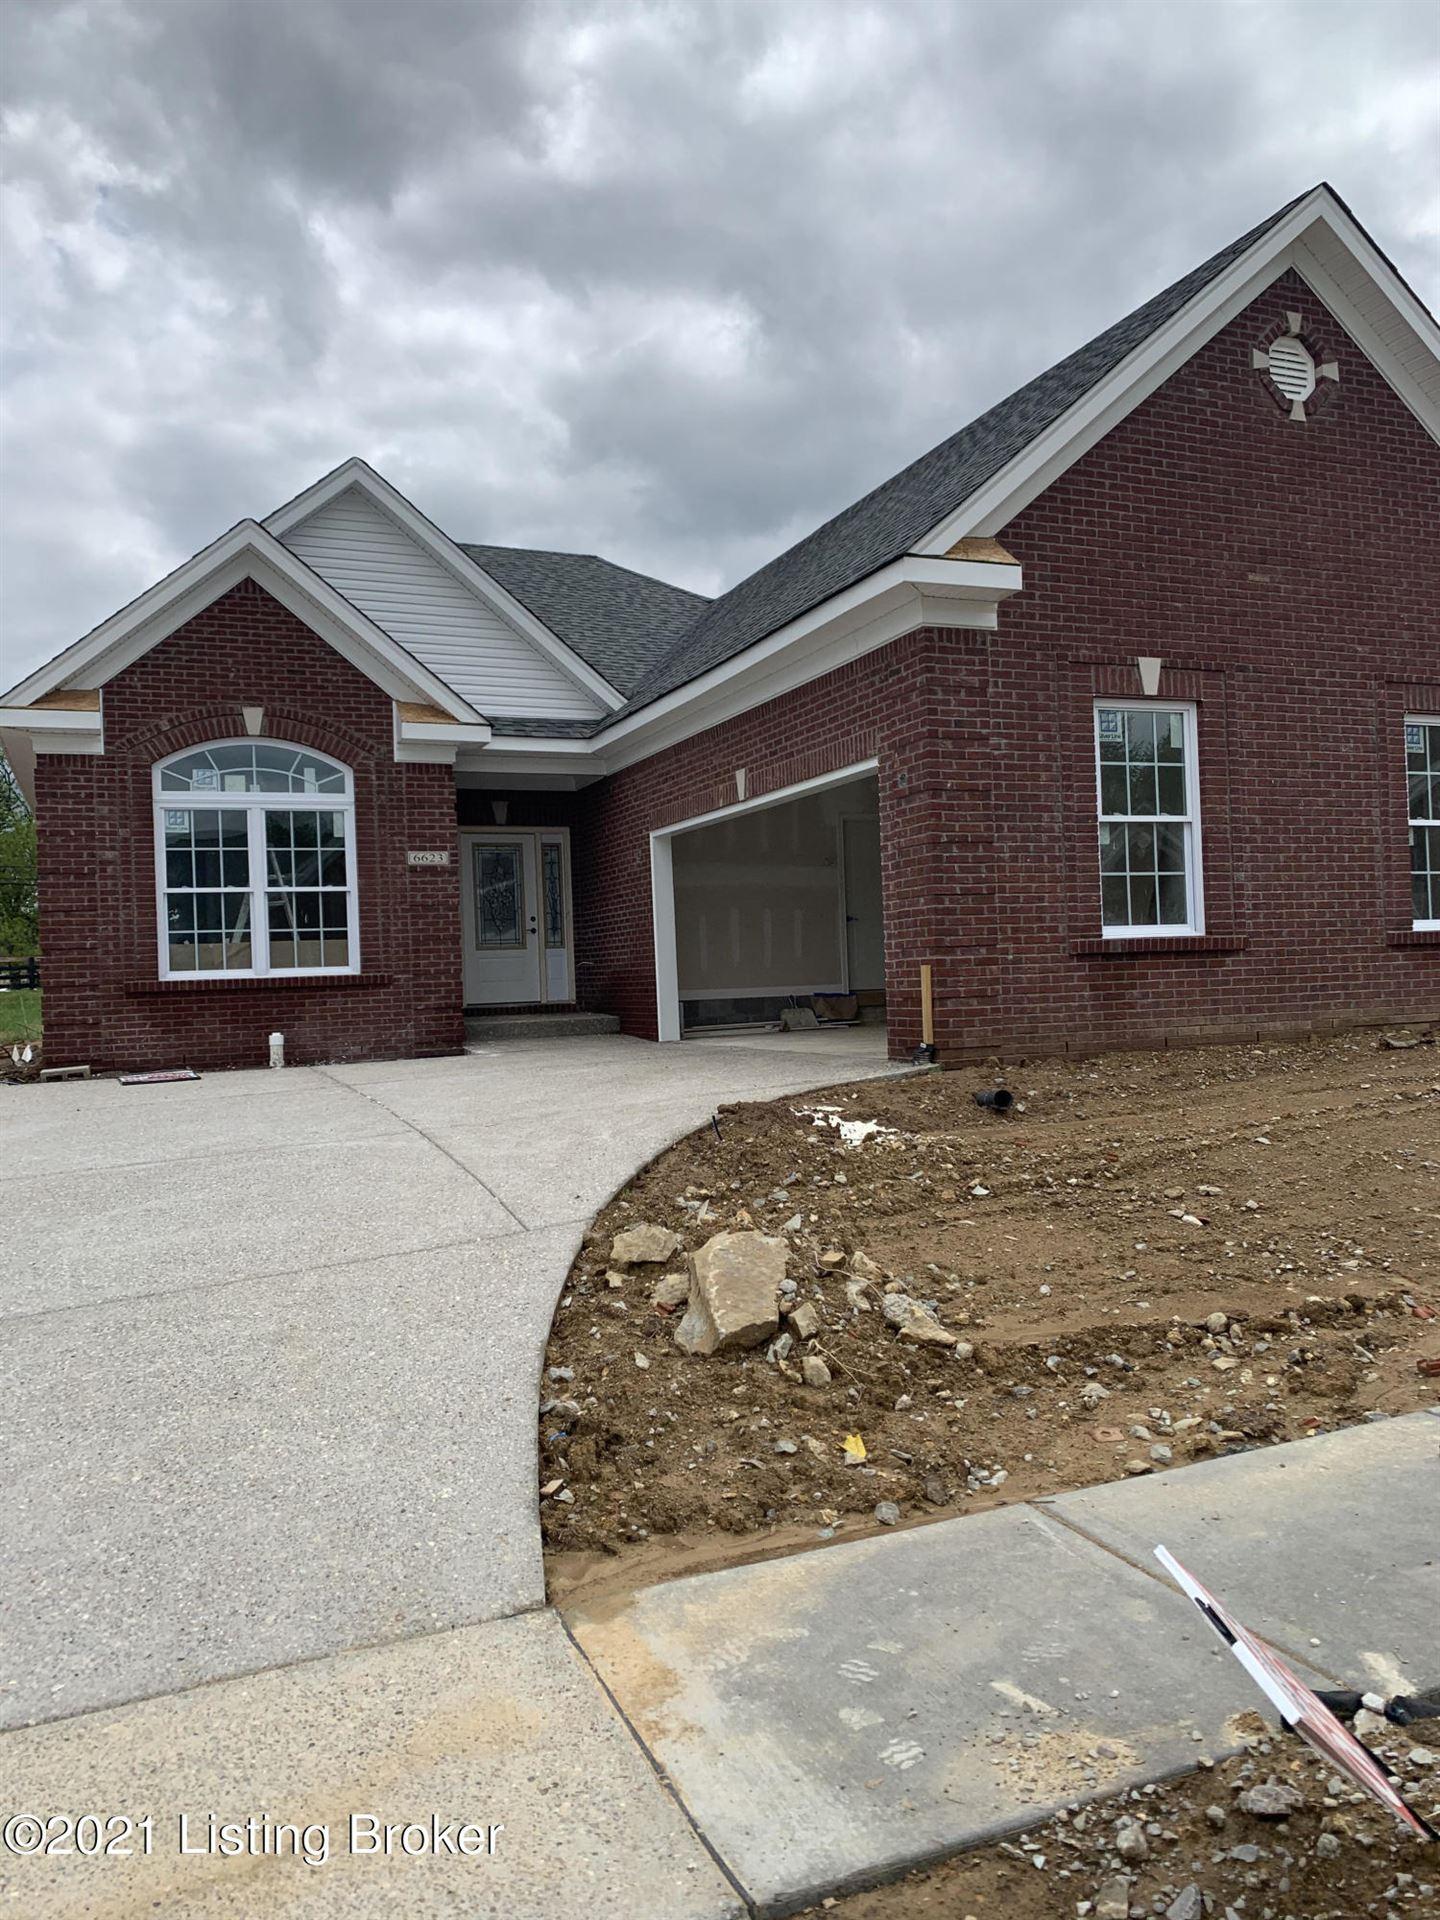 Photo of 6623 Villa Spring Dr, Louisville, KY 40291 (MLS # 1584871)